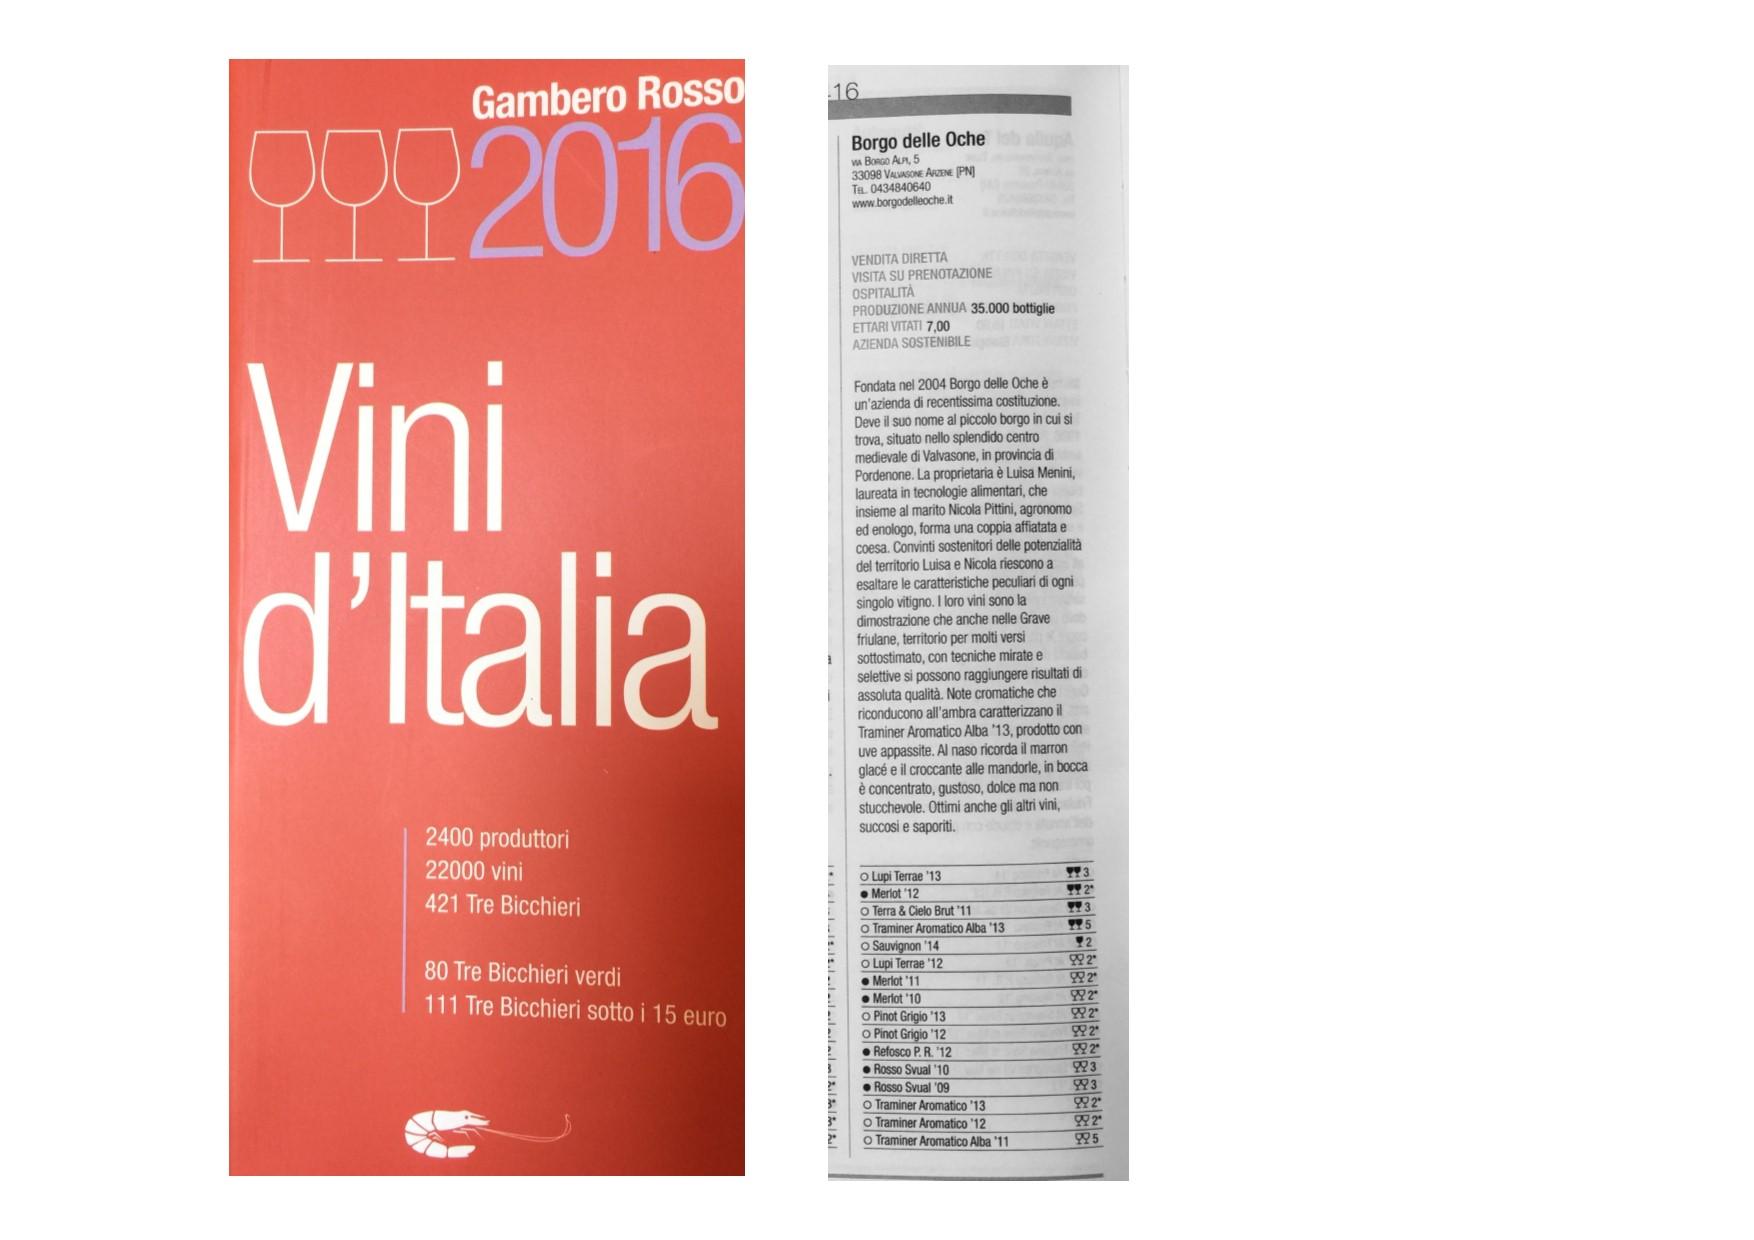 [cml_media_alt id='1495']gambero rosso 2016 cover[/cml_media_alt]